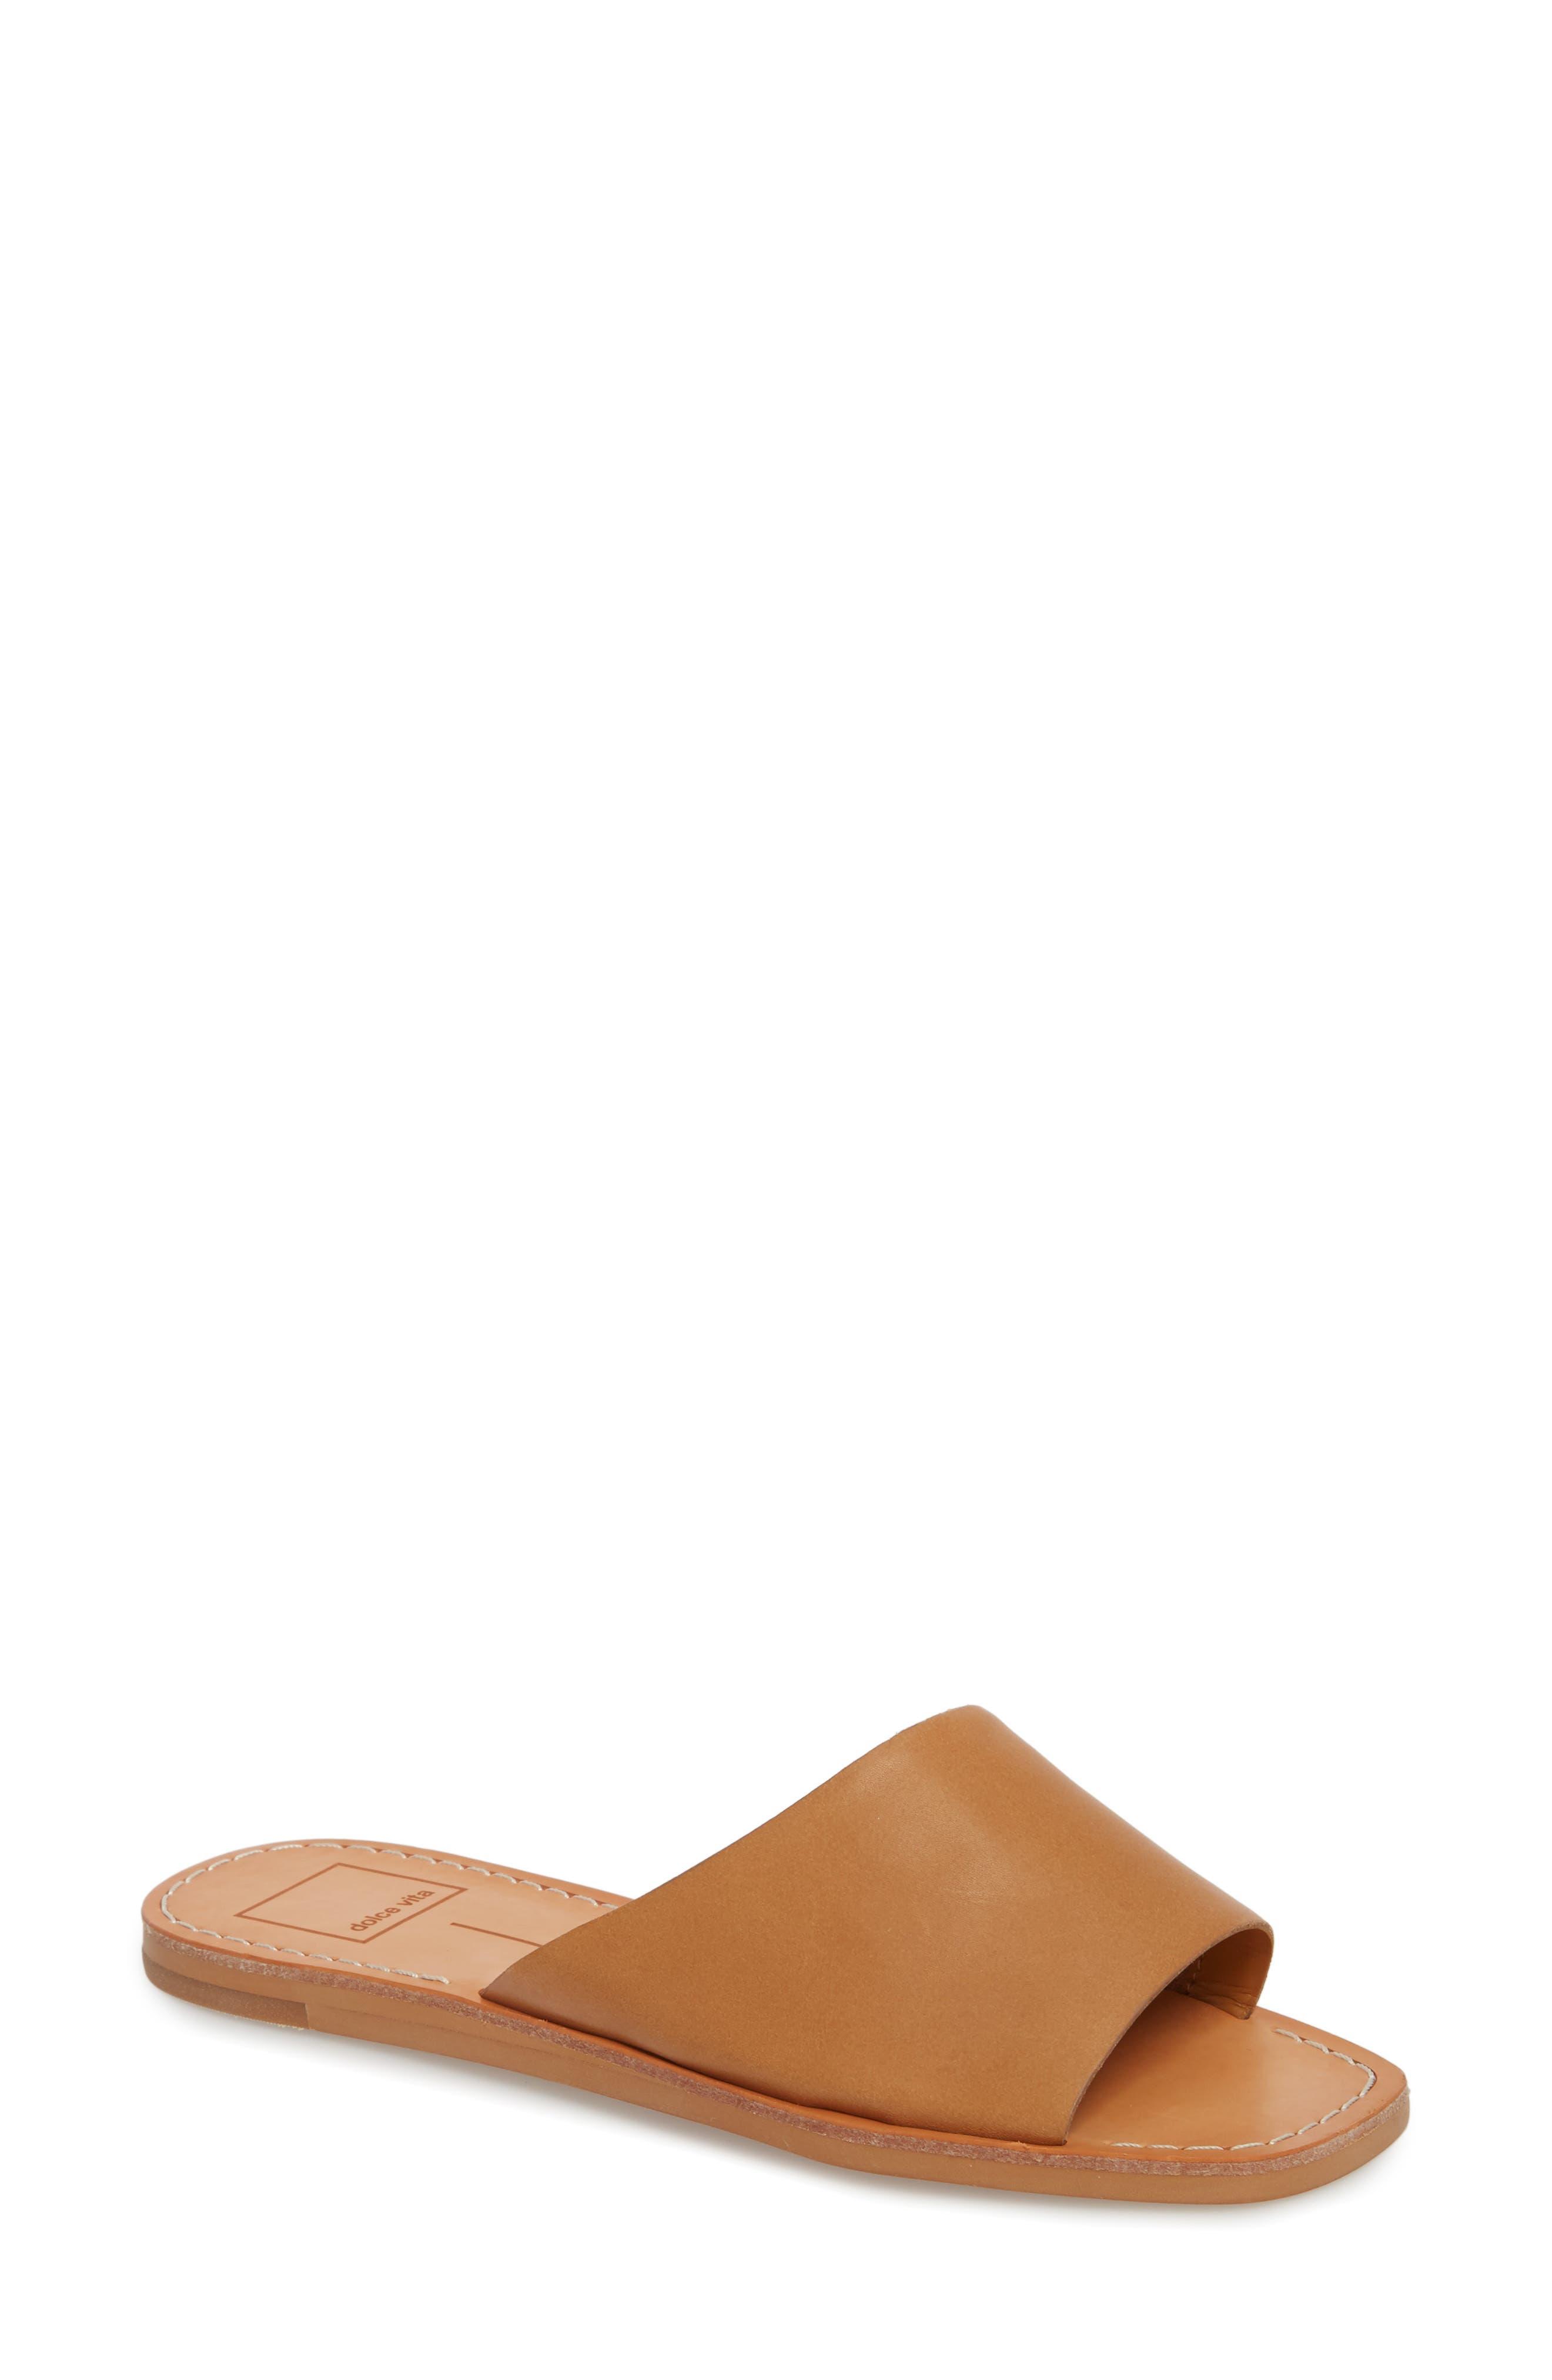 Cato Genuine Calf Hair Slide Sandal,                             Main thumbnail 2, color,